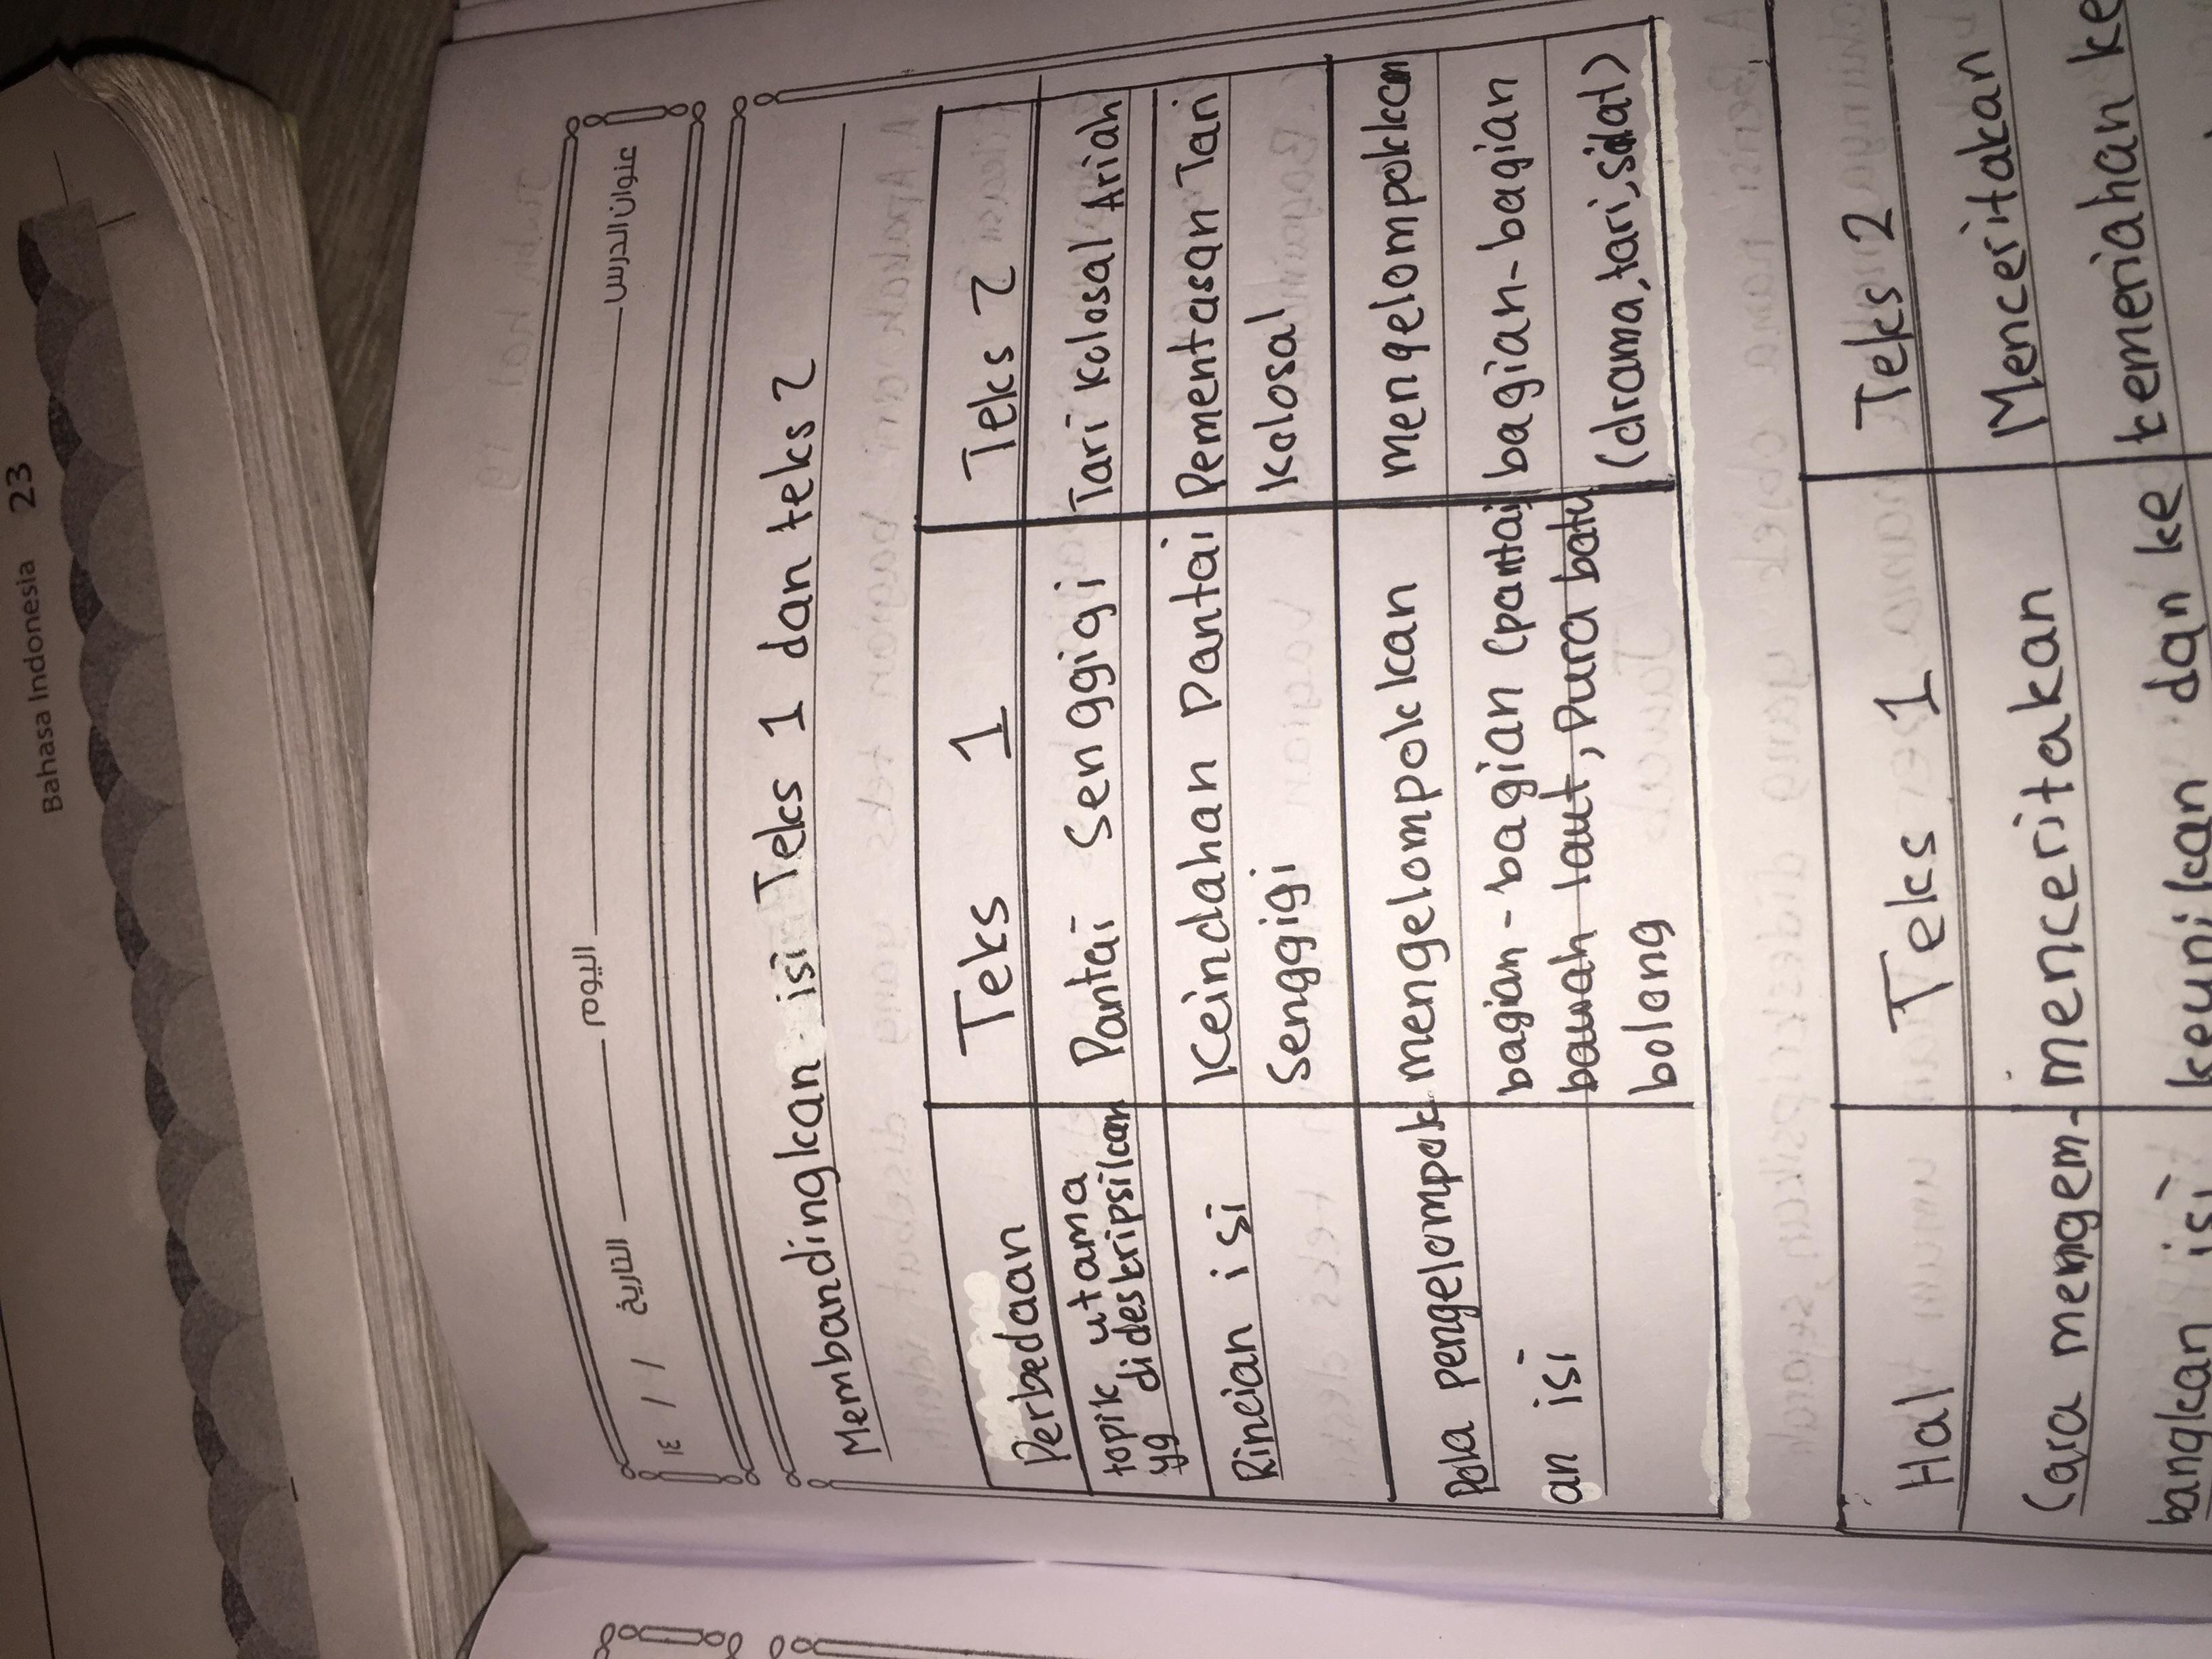 kunci jawaban buku siswa tematik kelas 3 tema 6 energi dan perubahannya kurikulum 2013 ruang edukasi. Kunci Jawaban Lks Bahasa Jawa Kelas 6 Semester 1 2 10 Soal Dan Jawaban Bahasa Jawa Kelas 6 Kumpulan Contoh Cute766 Gif